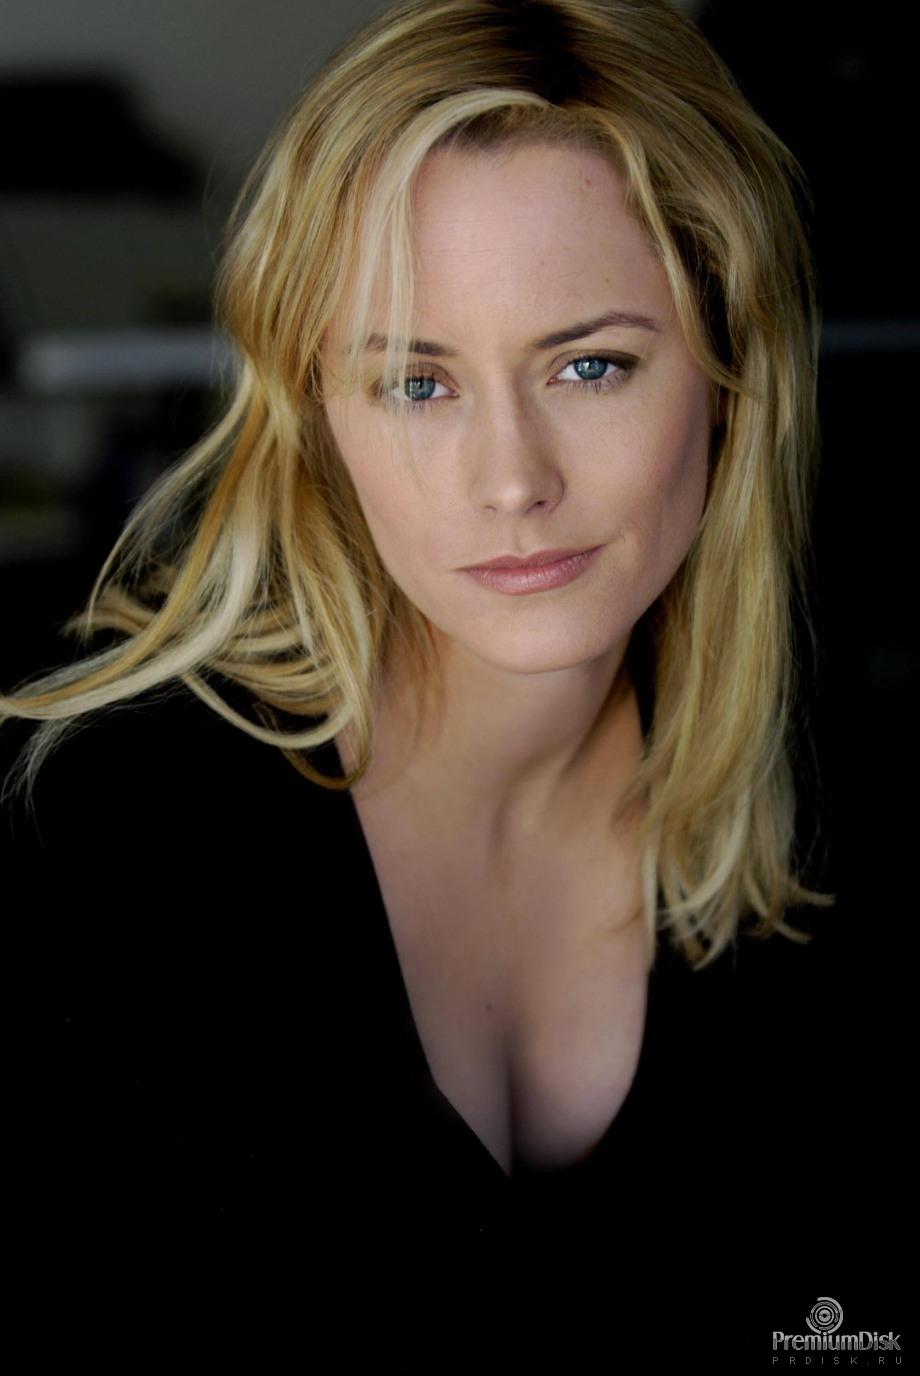 Paige Selenski